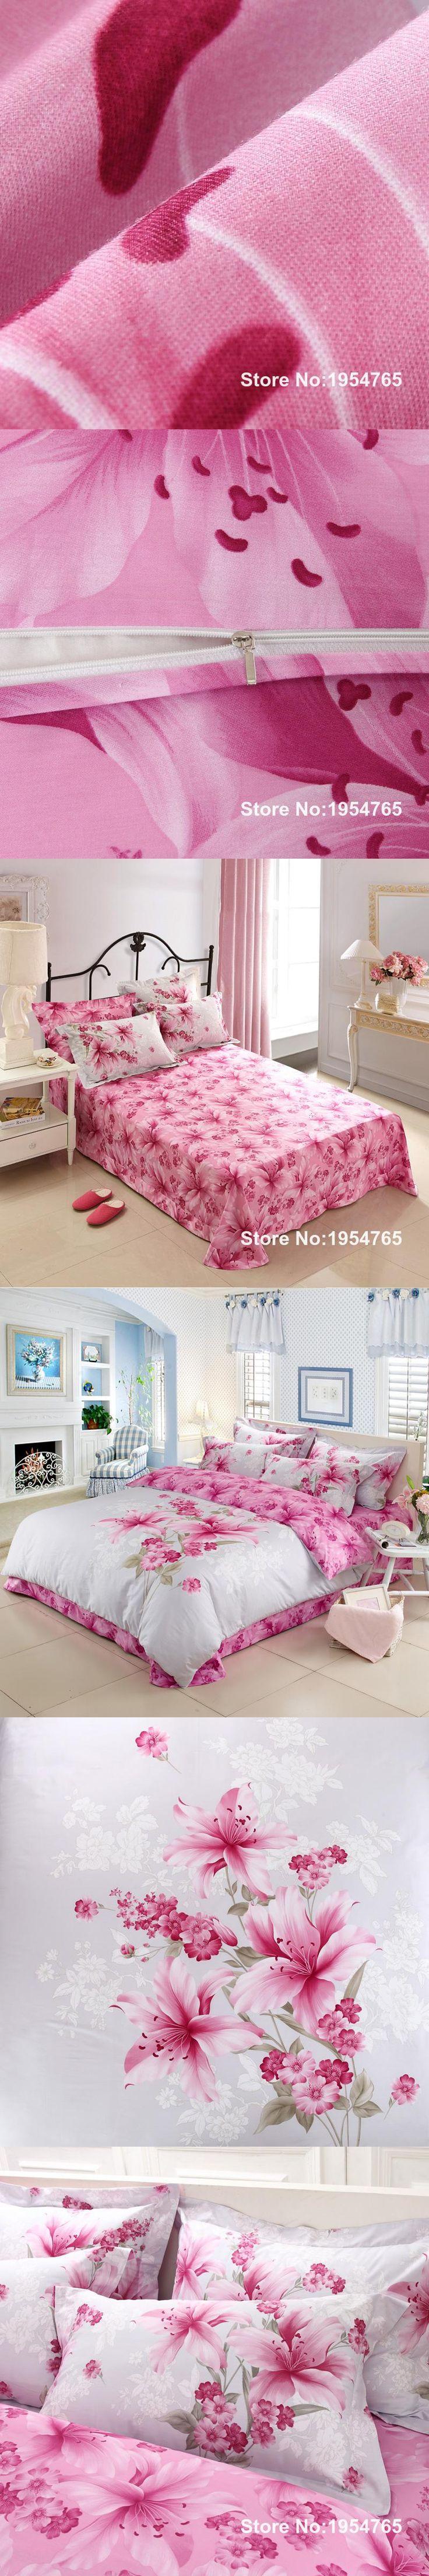 ARNIGU Pink lily Flower 3D printing white Bedding set 100% Cotton Queen King size Duvet/Quilt cover Flat bedsheet pillowcases